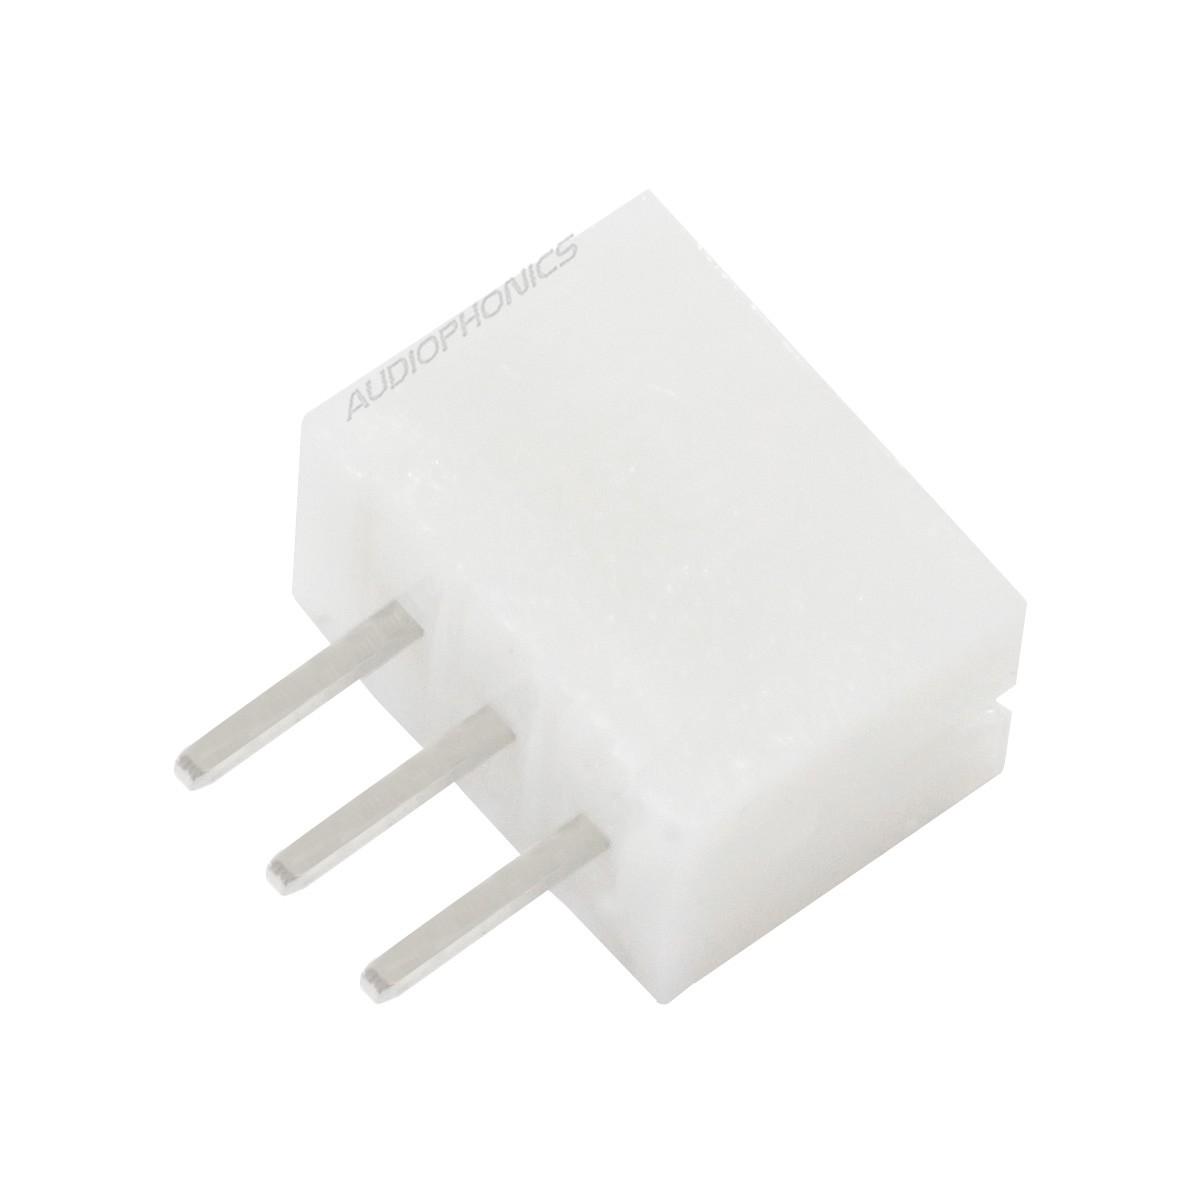 PH 2.0mm Male Socket 3 Channels White (Unit)